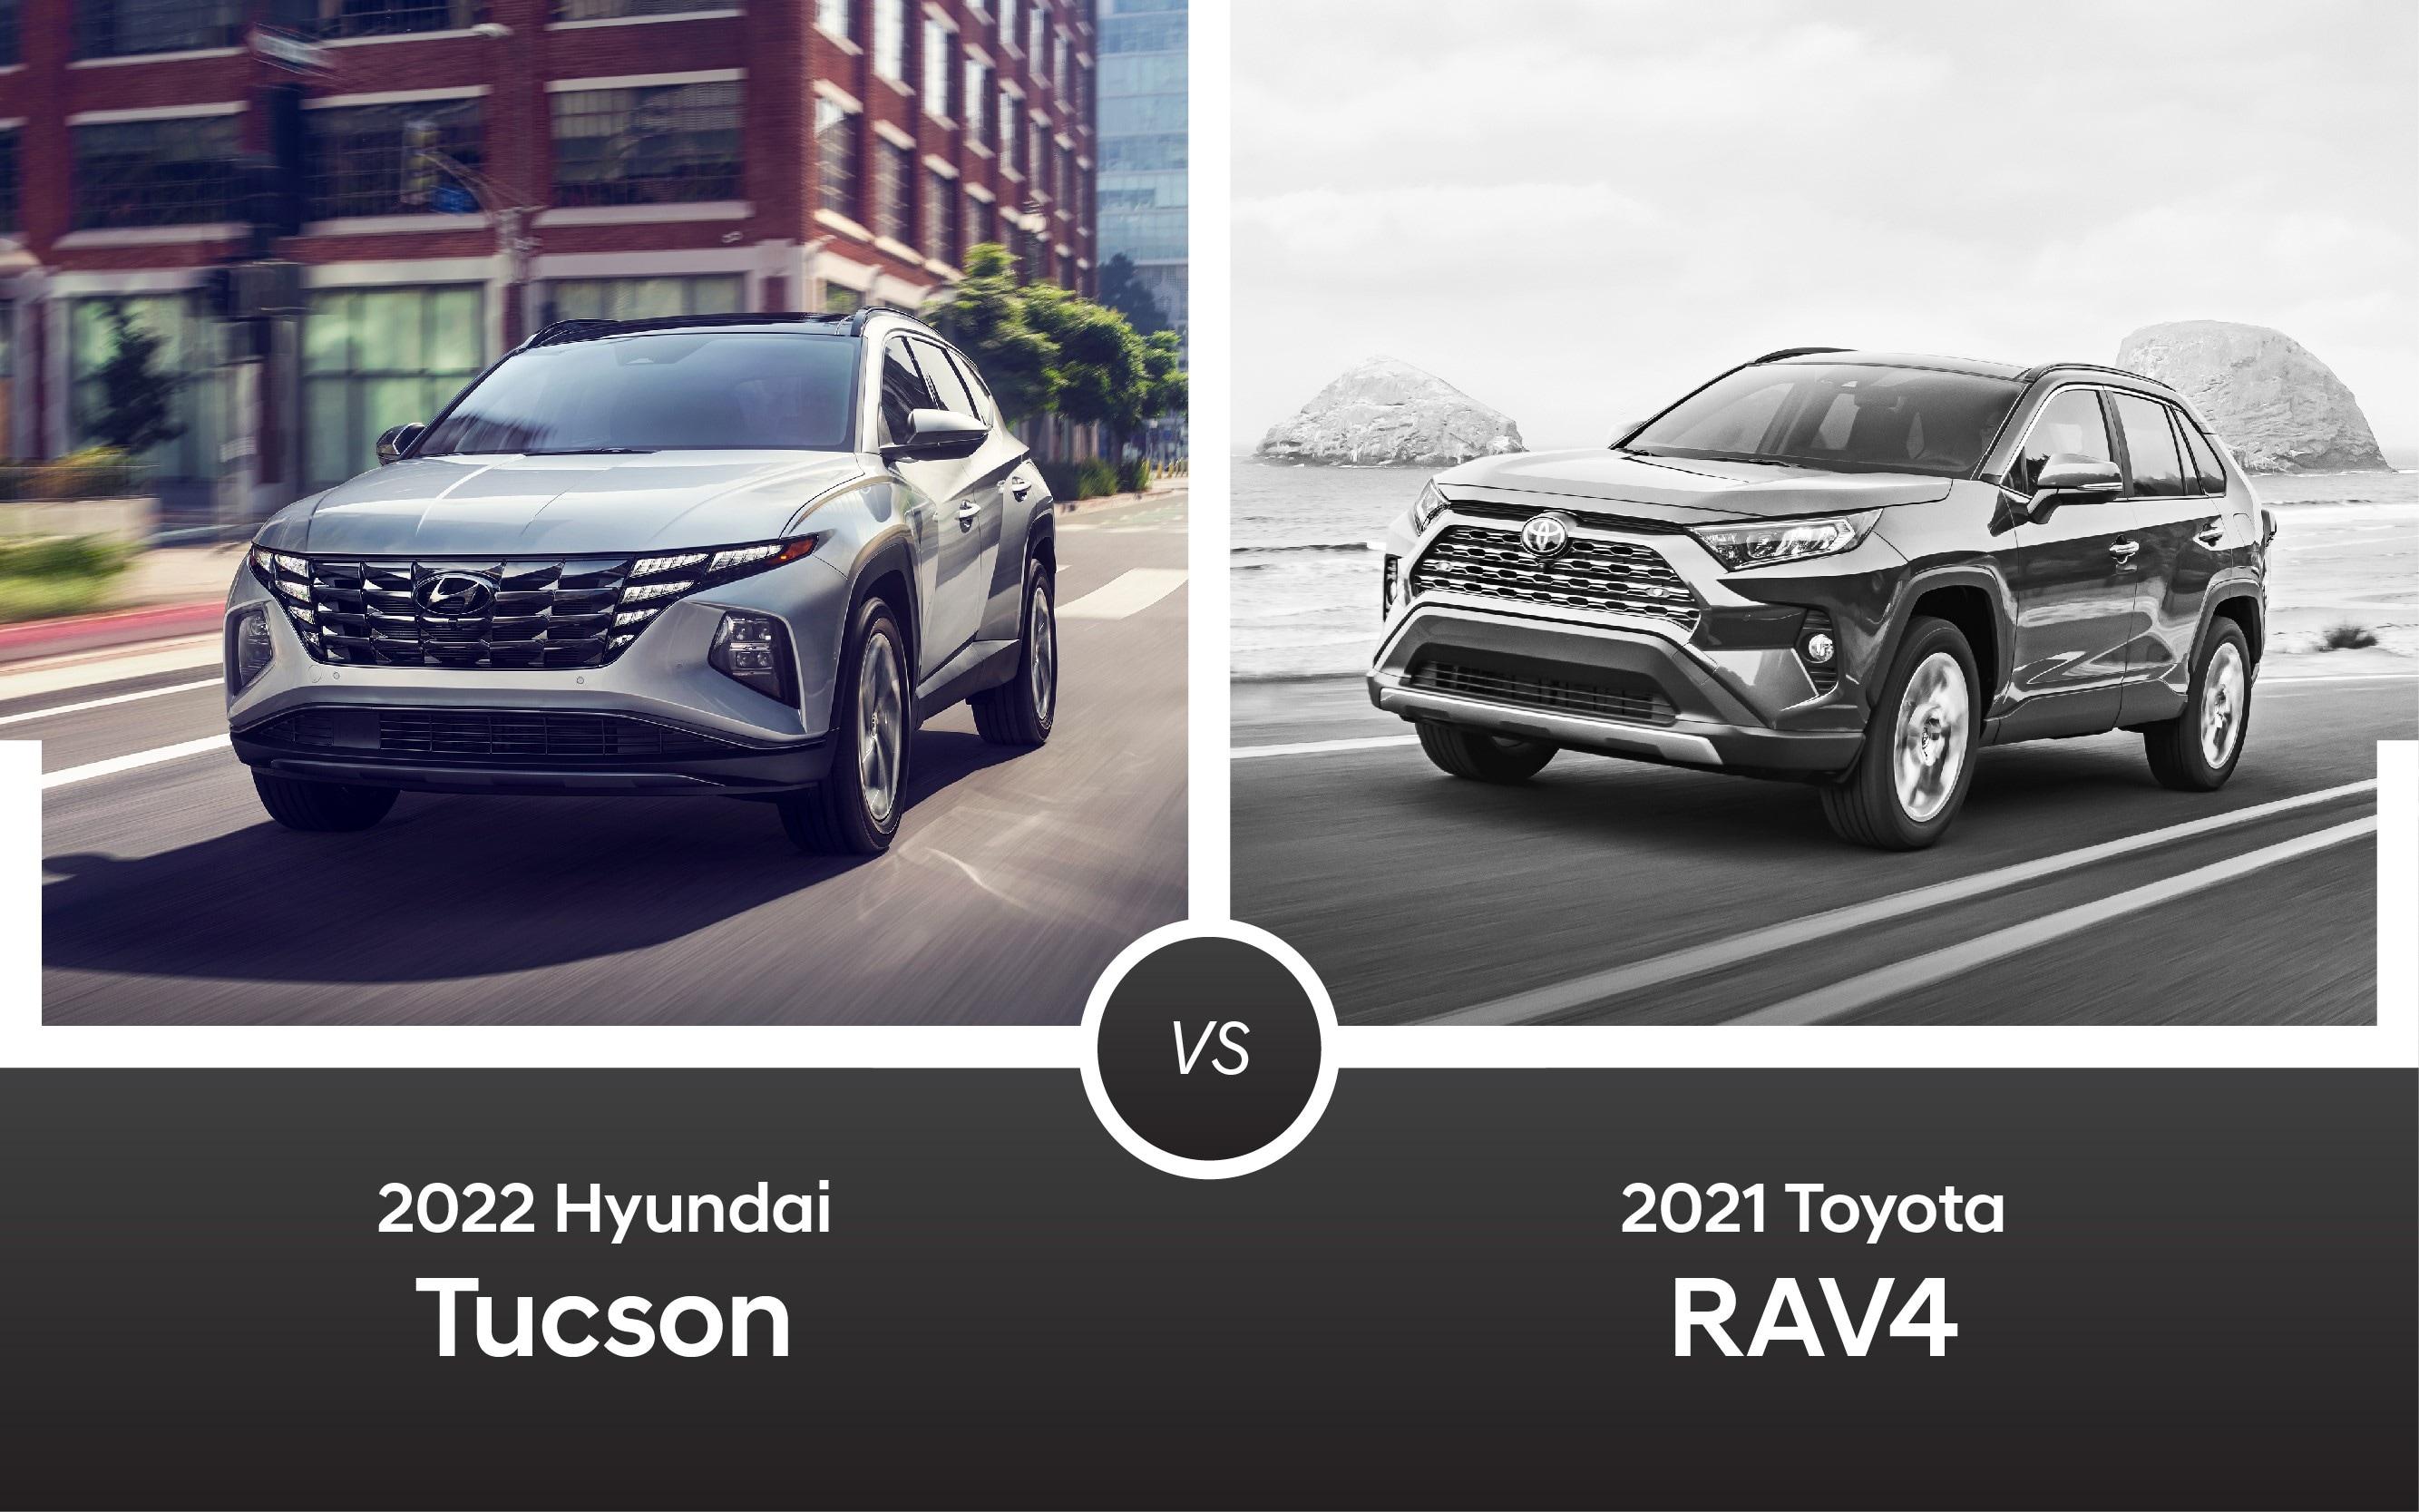 2022 Hyundai Tucson vs. 2021 Toyota RAV4